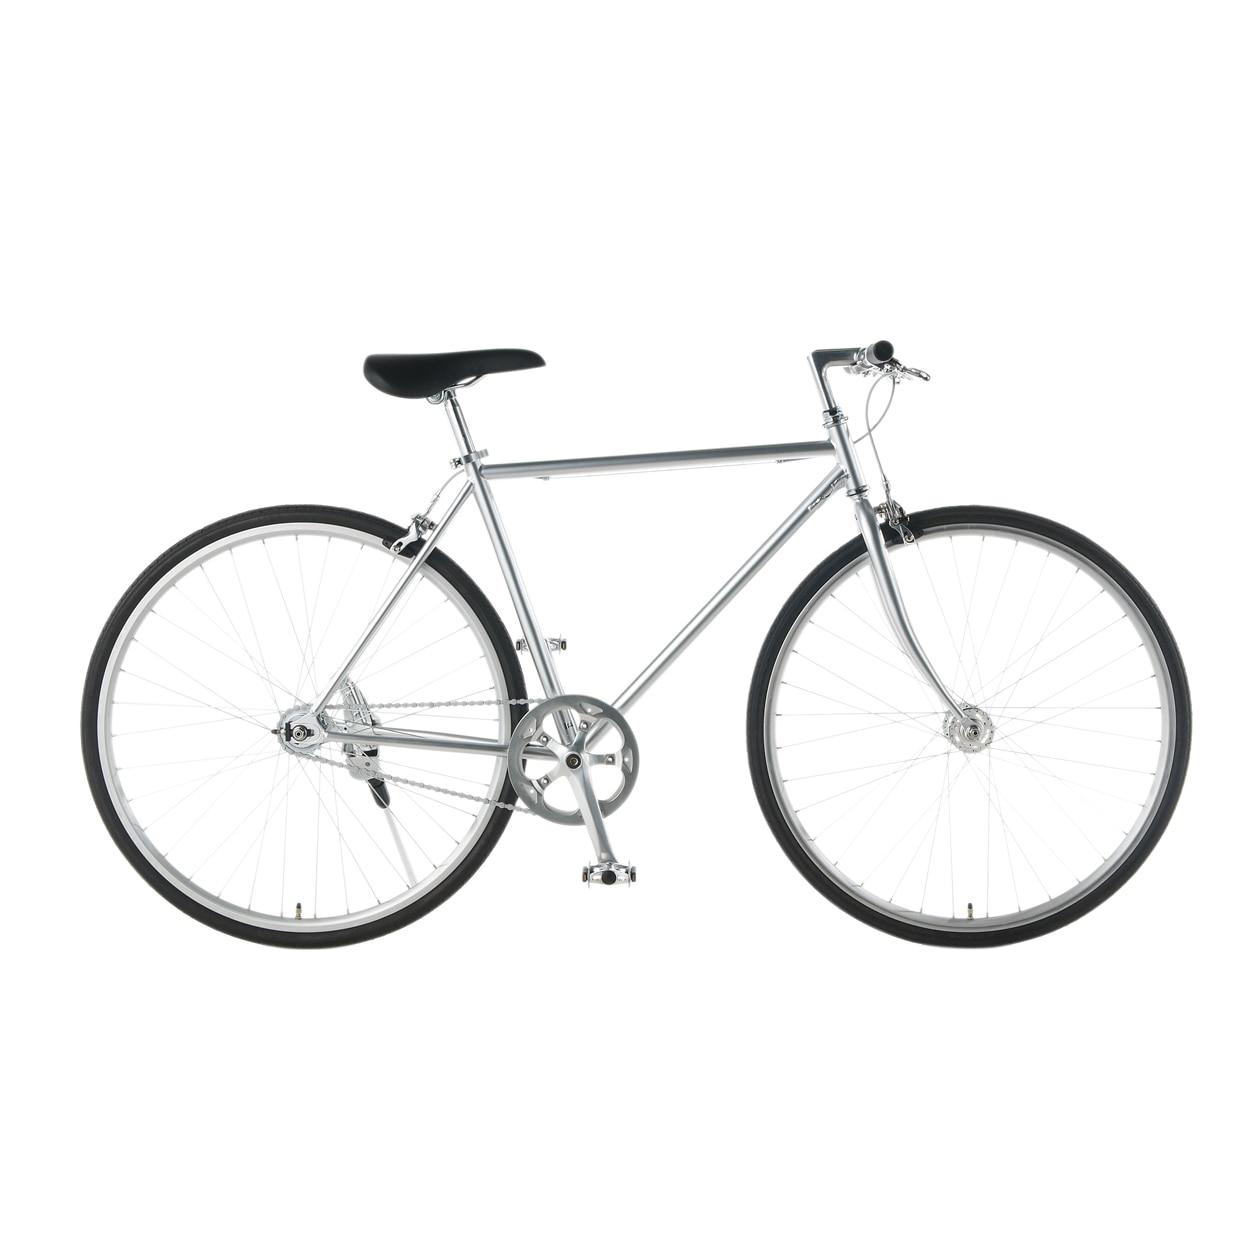 700Cクロモリ自転車・スポーツタイプ